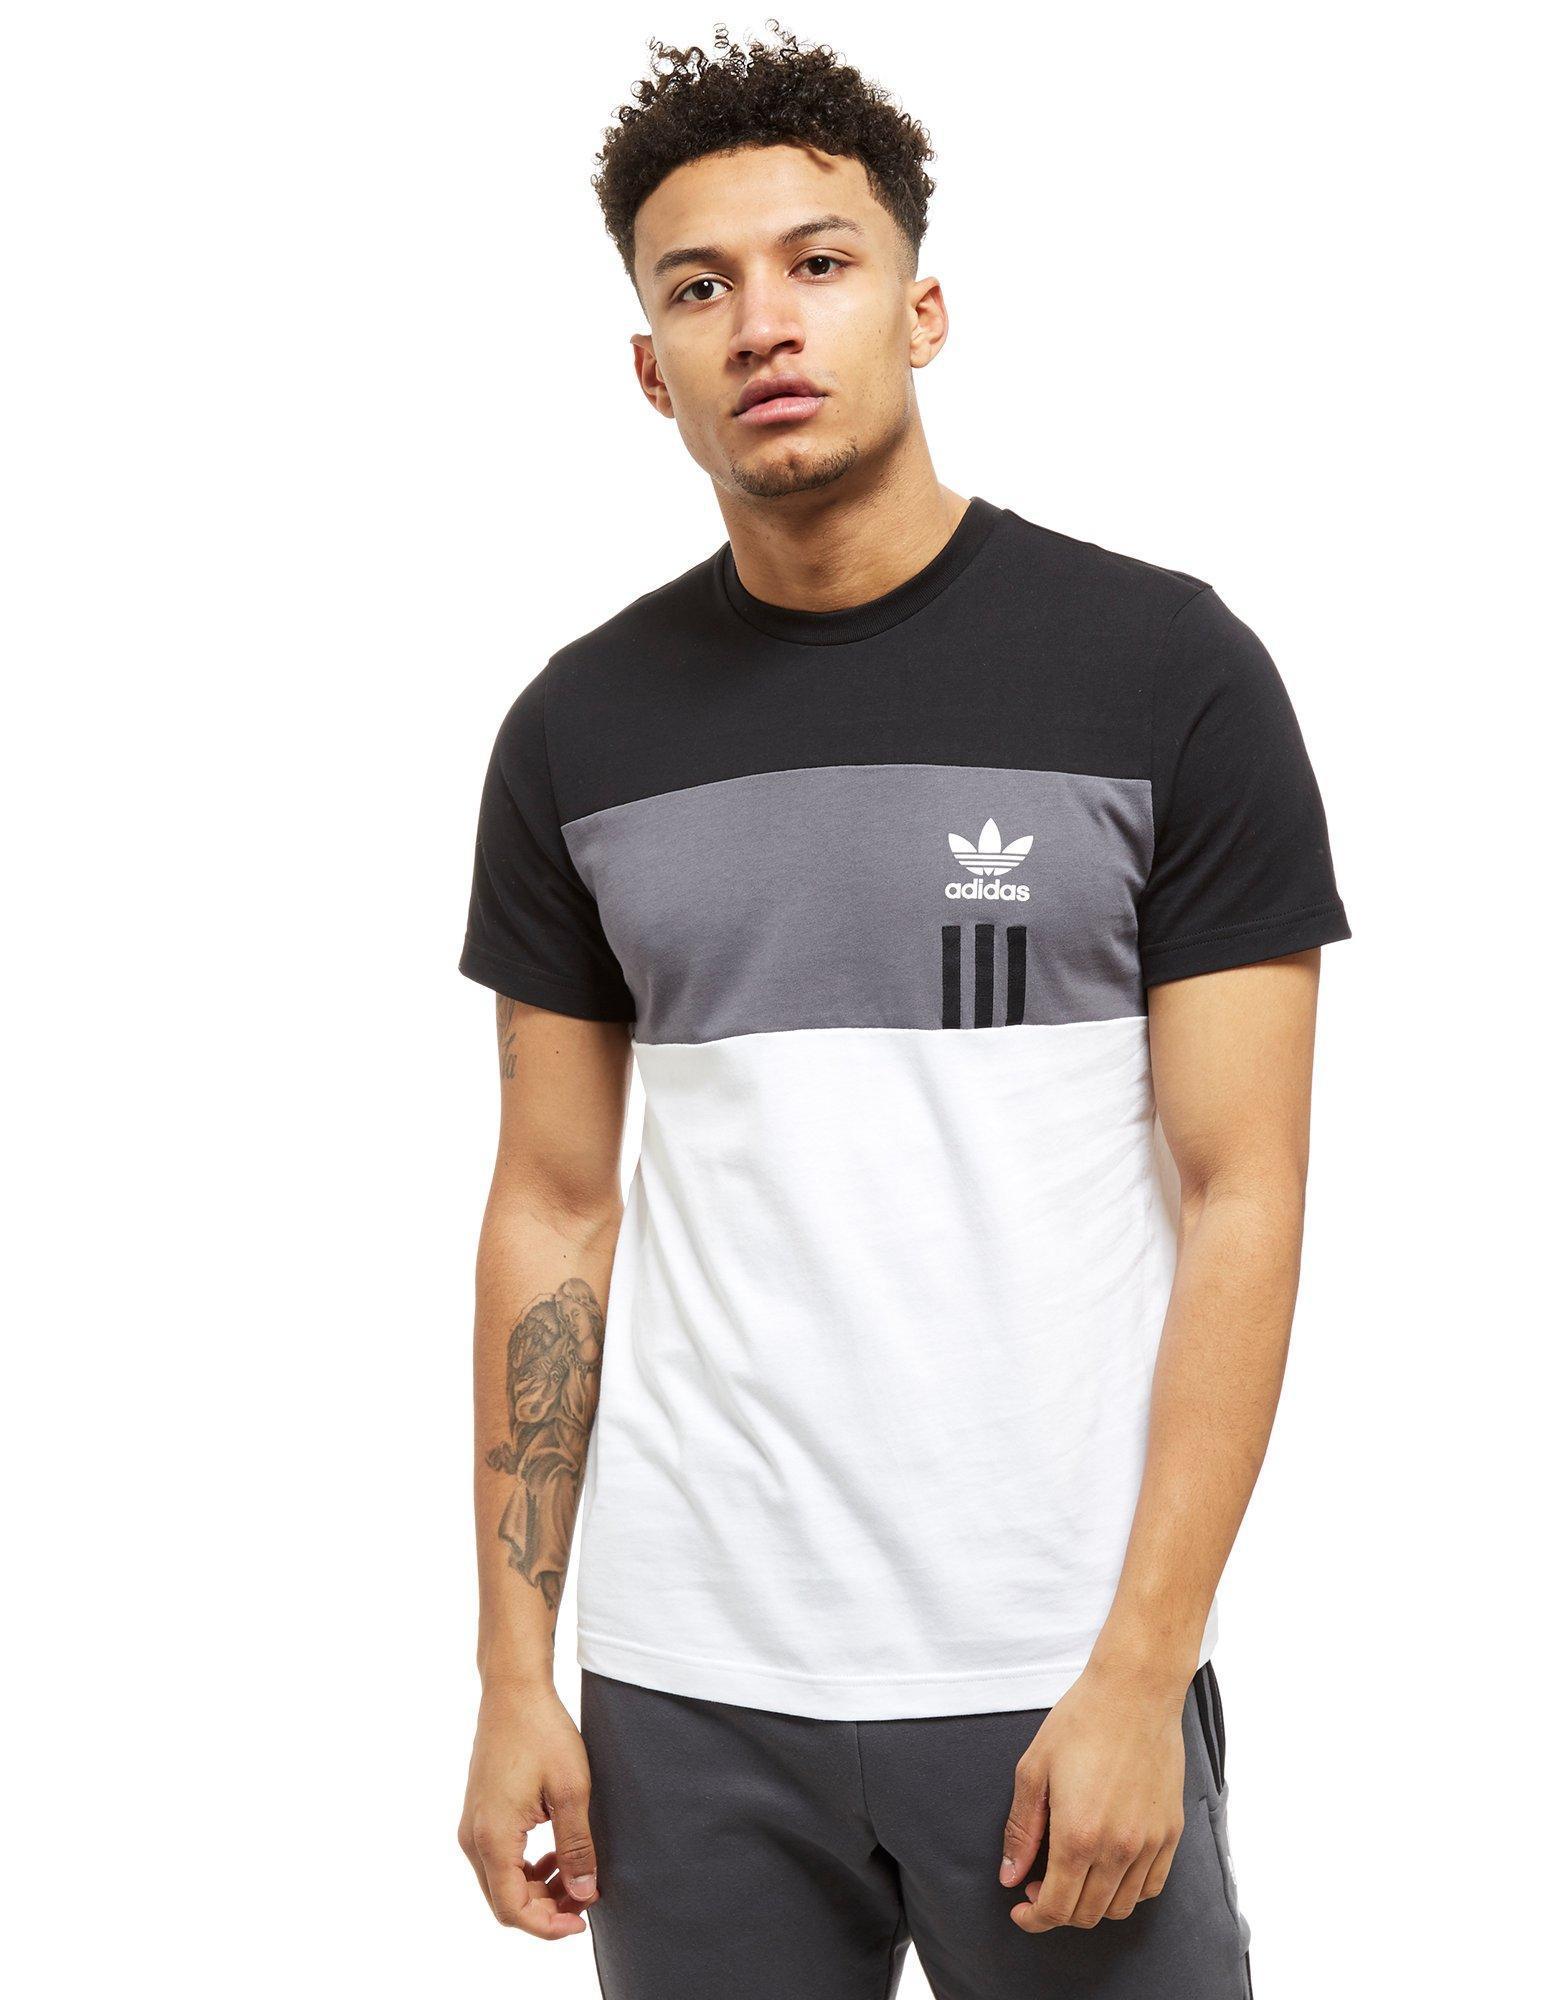 444977e27 adidas Originals Id96 T-shirt in Black for Men - Lyst